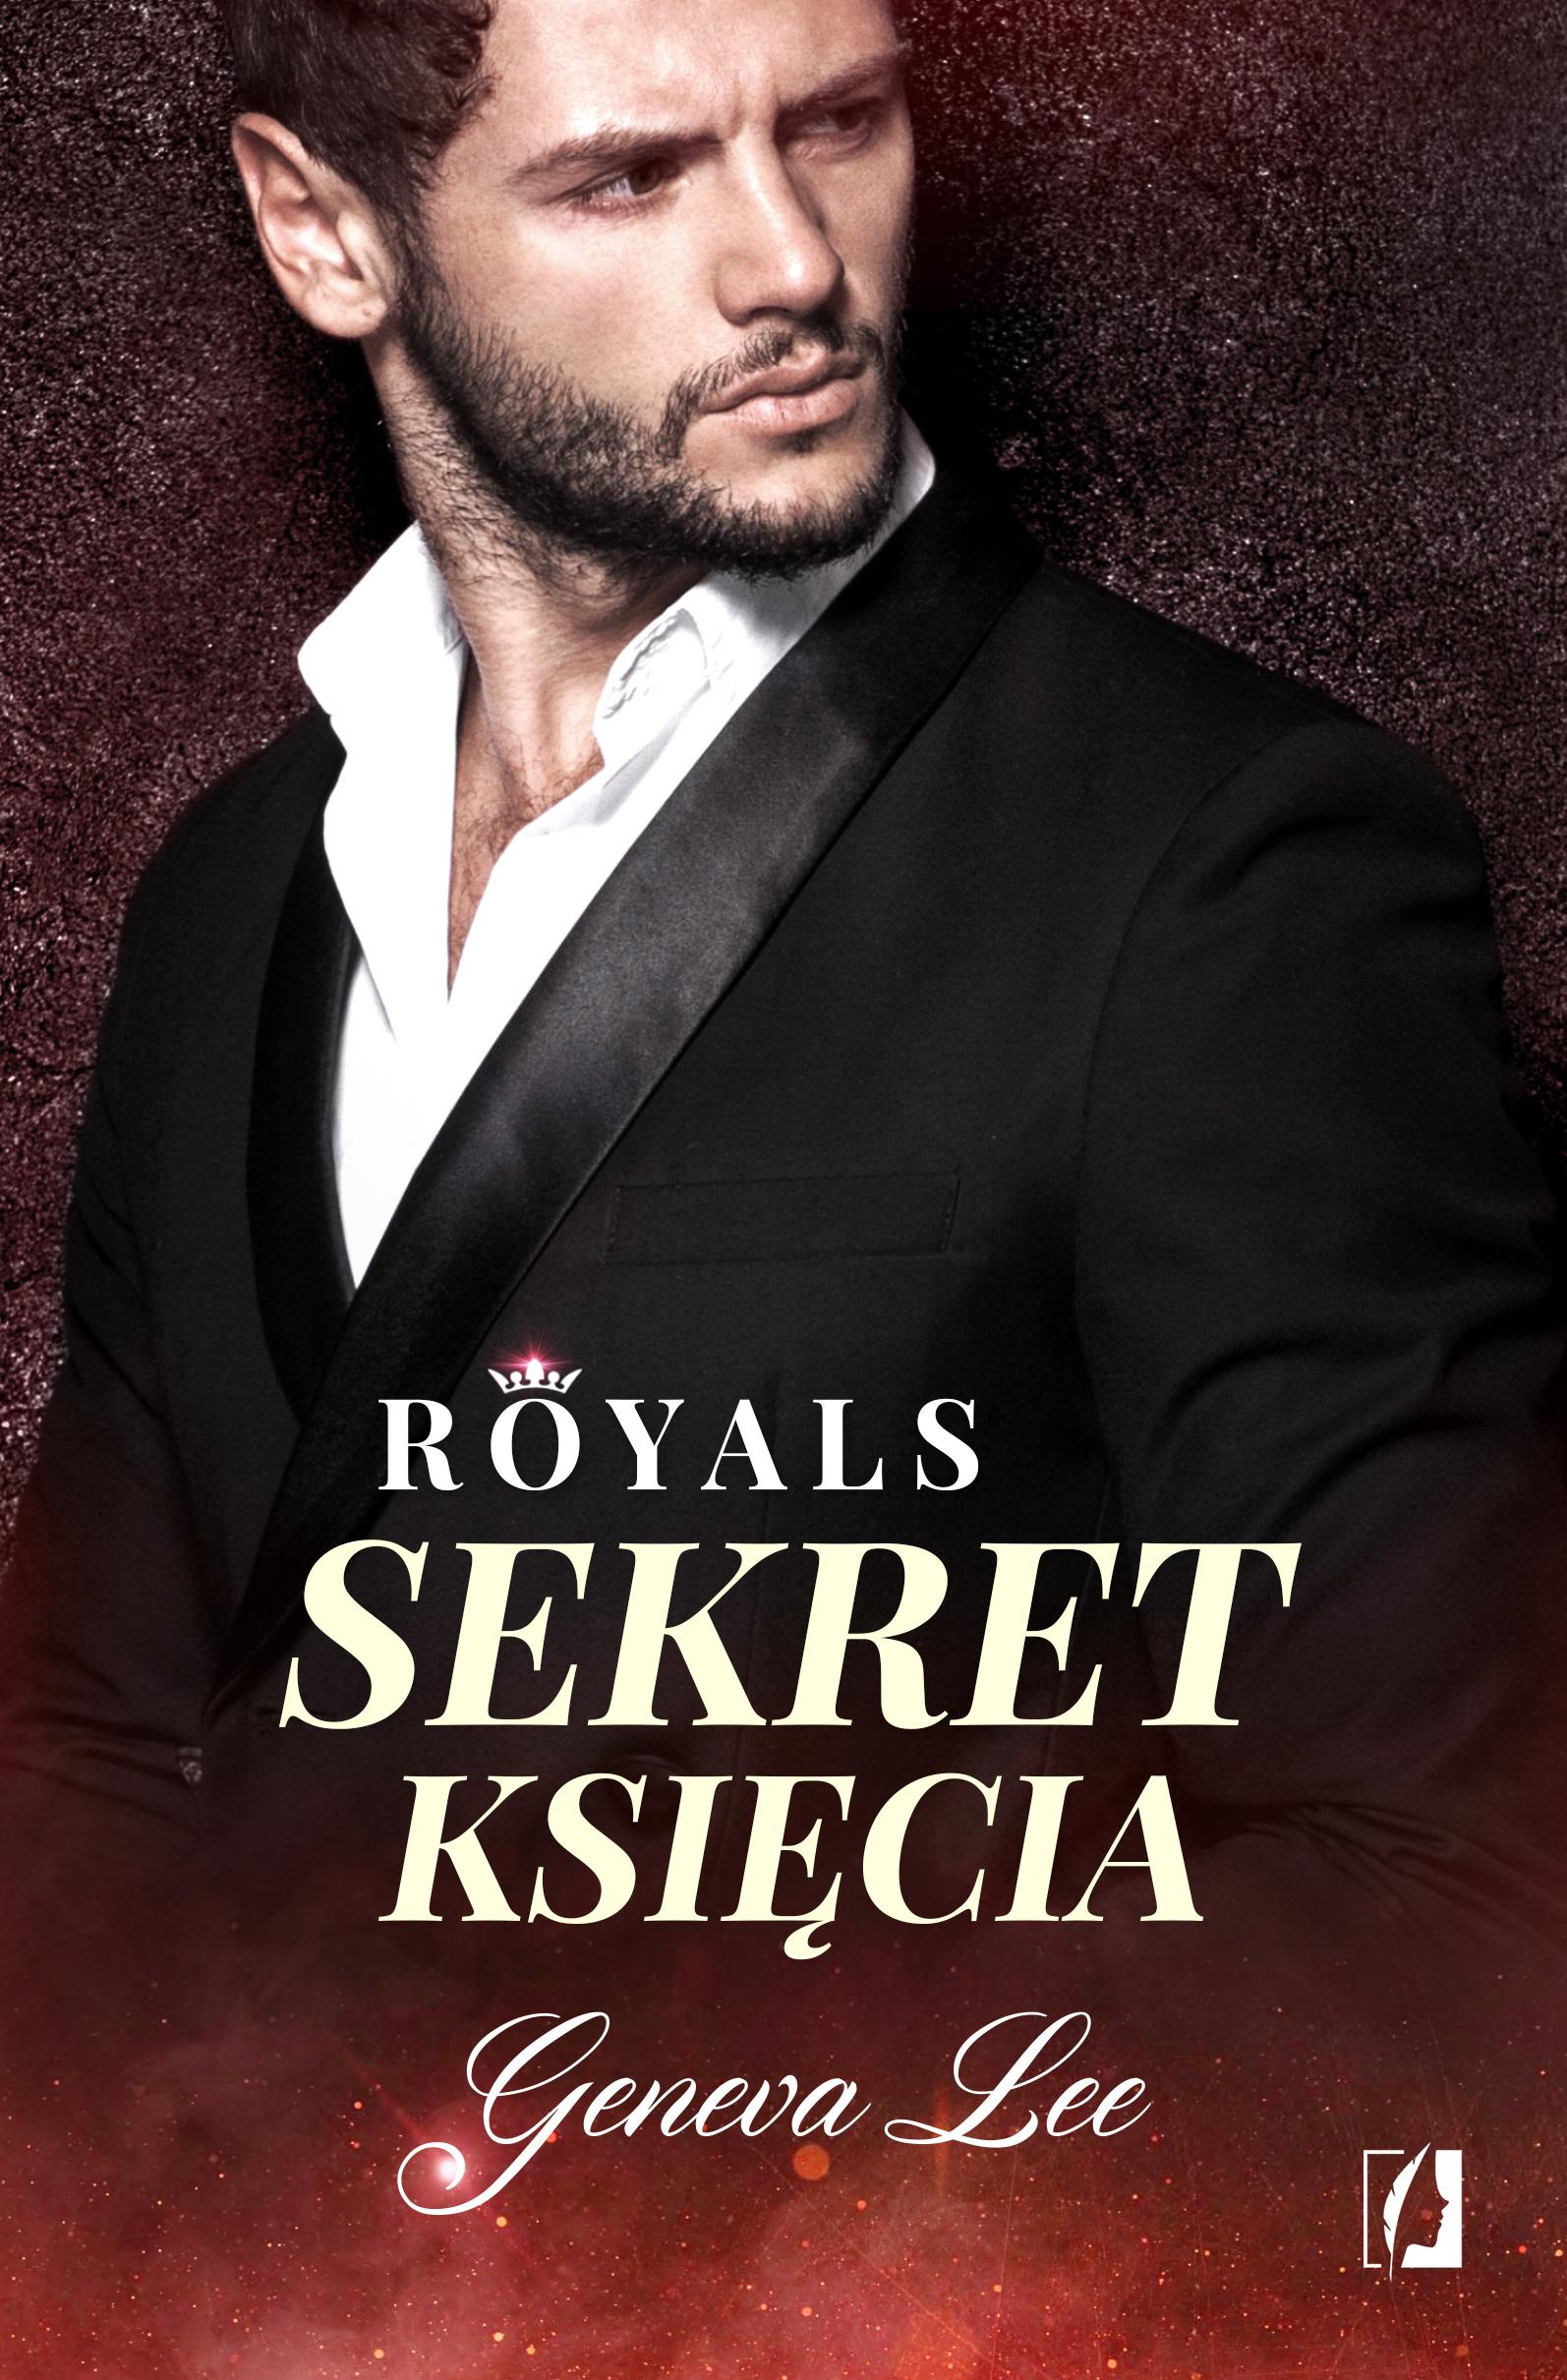 SEKRET KSIĘCIA ROYALS TOM 2, GENEVA LEE